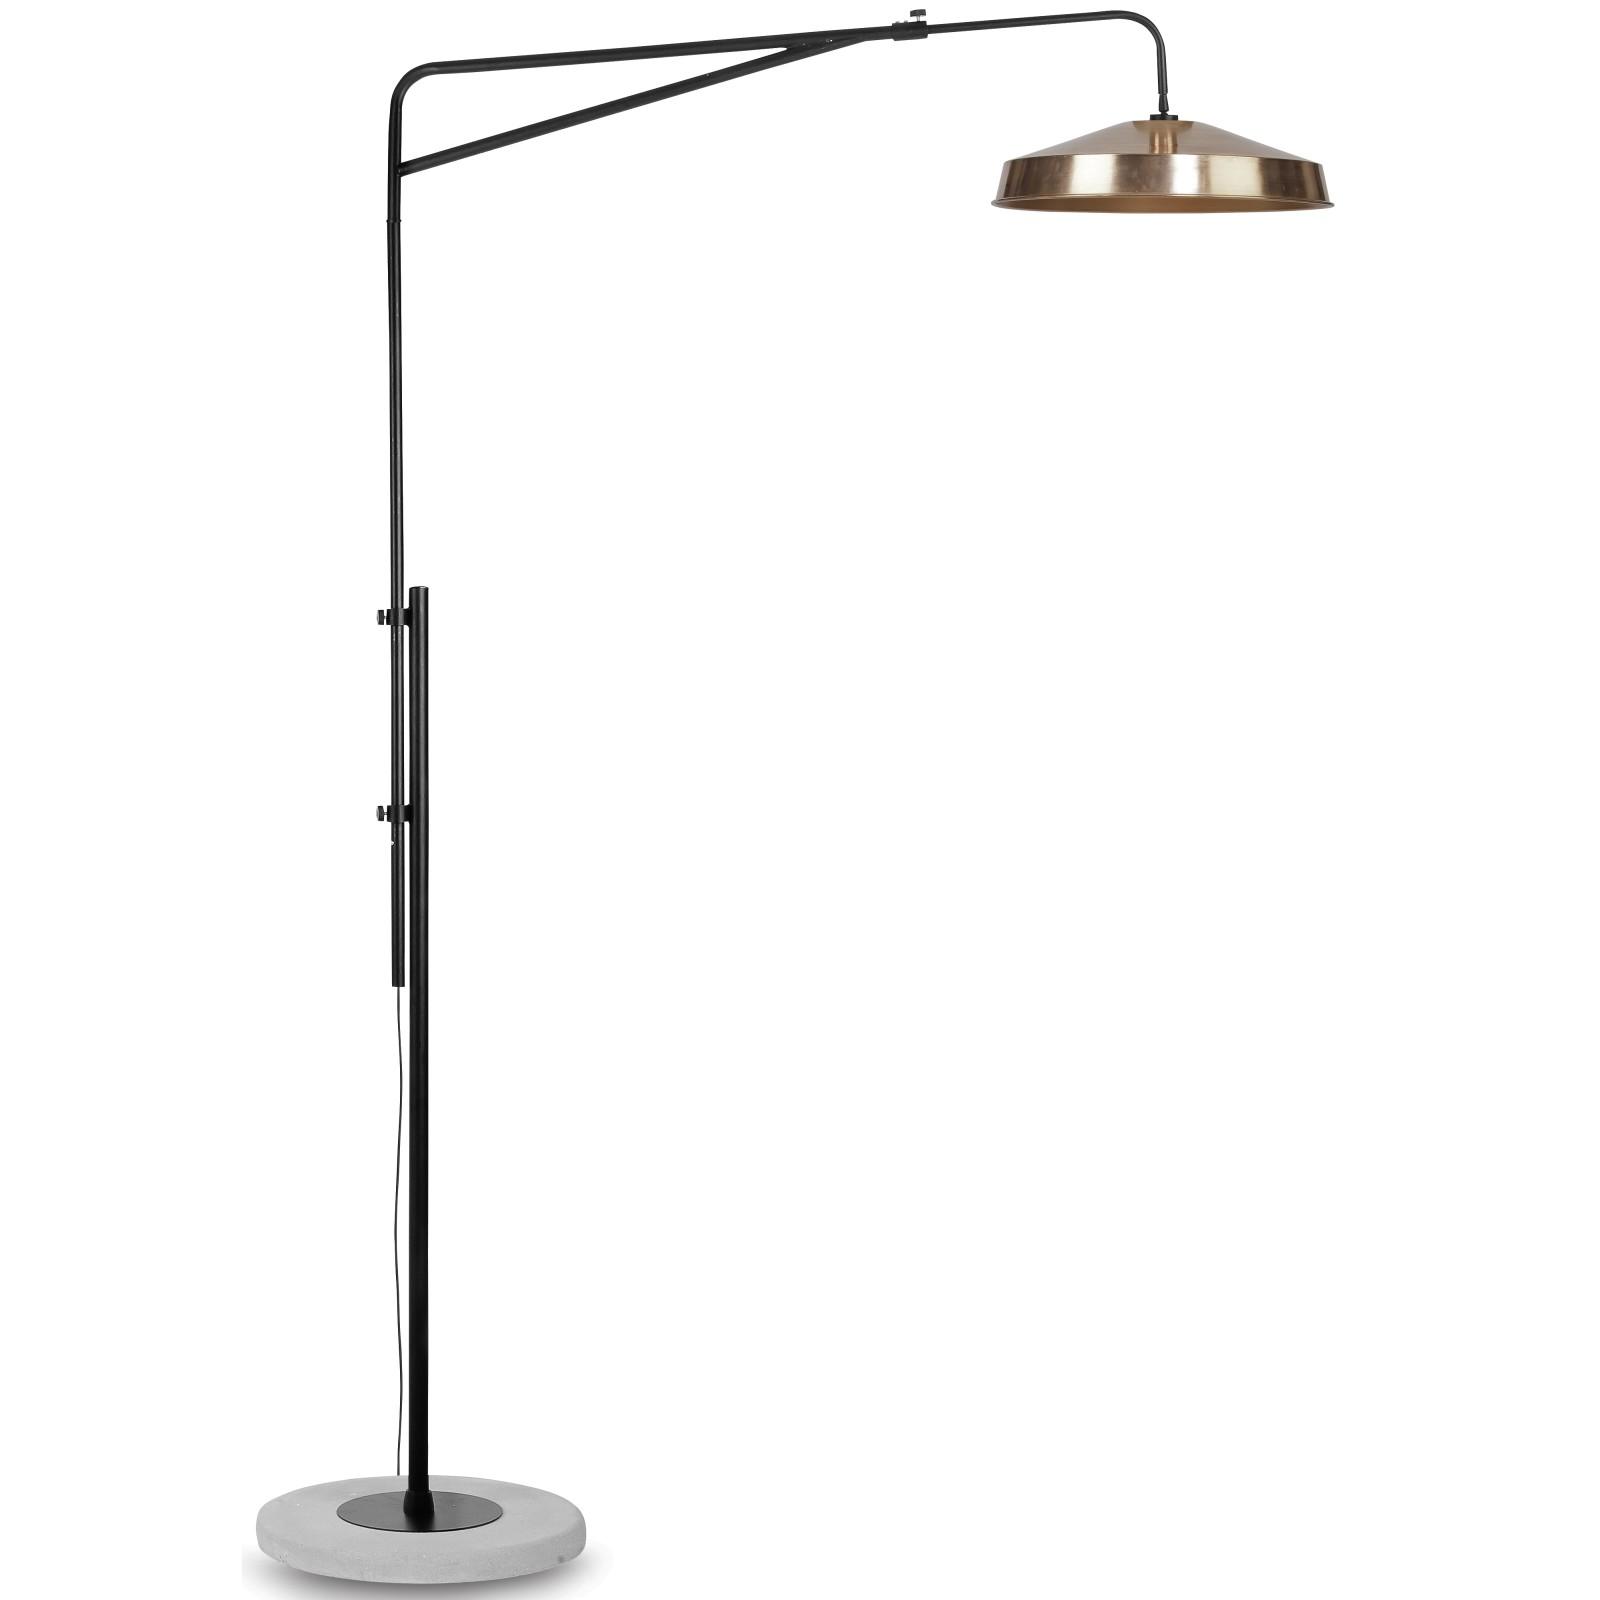 Brighton floor lamp Brighton floor lamp - Copper shade